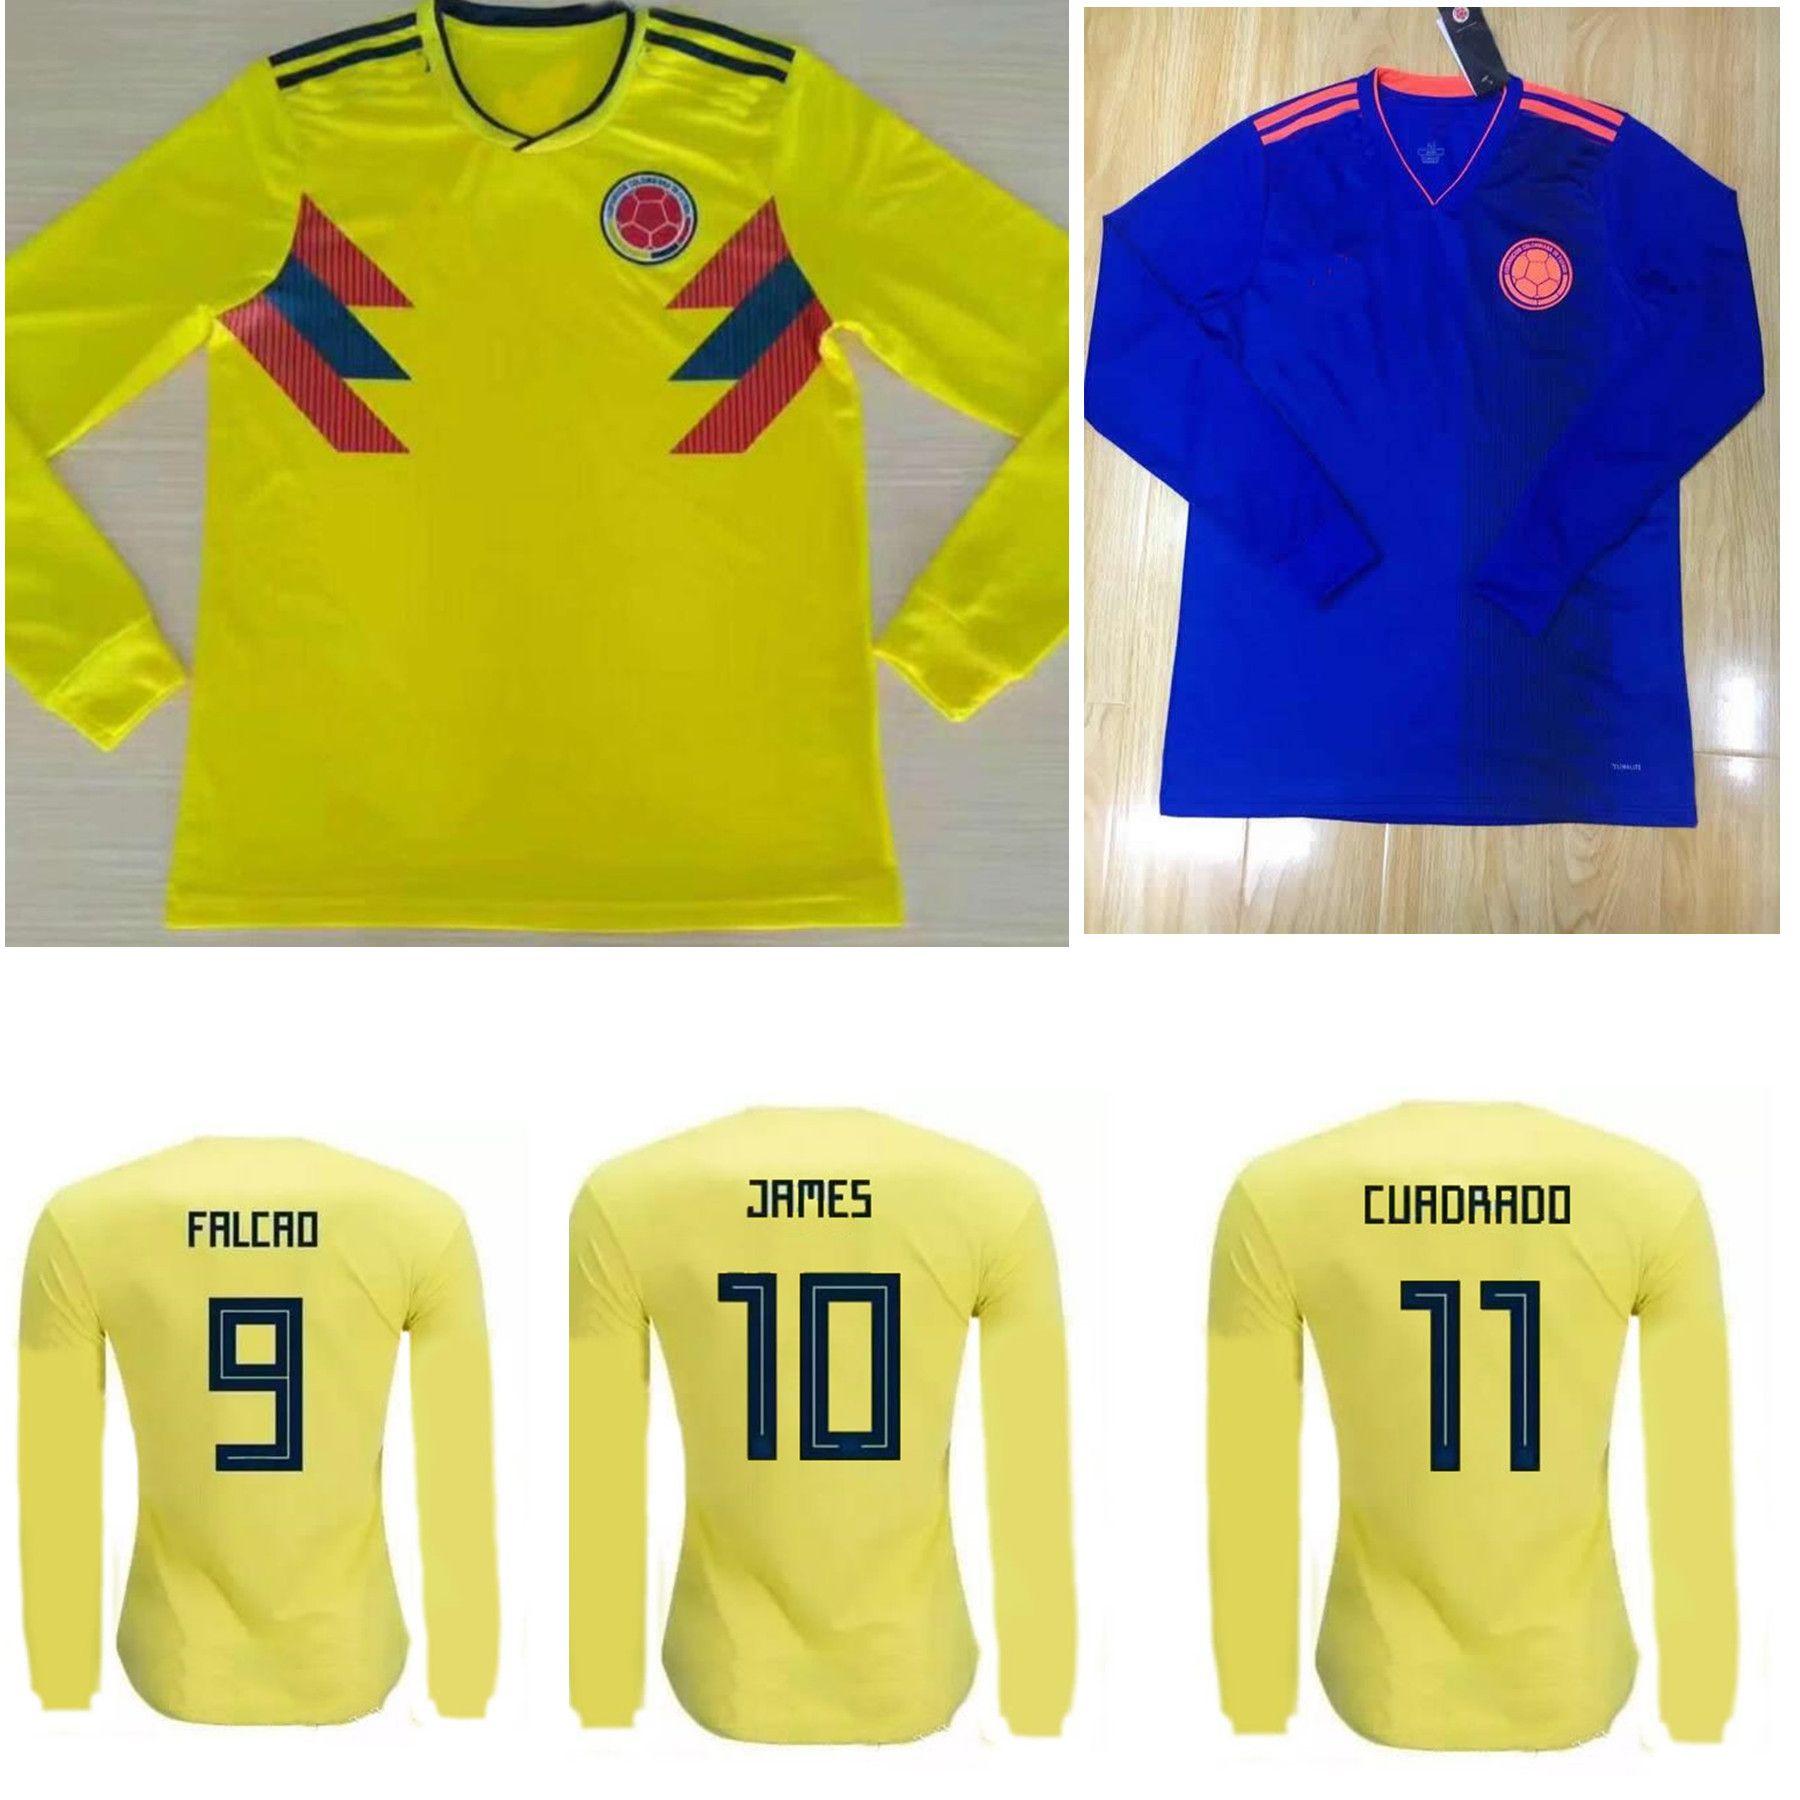 Buy Cheap Football Shirts From China - Cotswold Hire eebc47fda